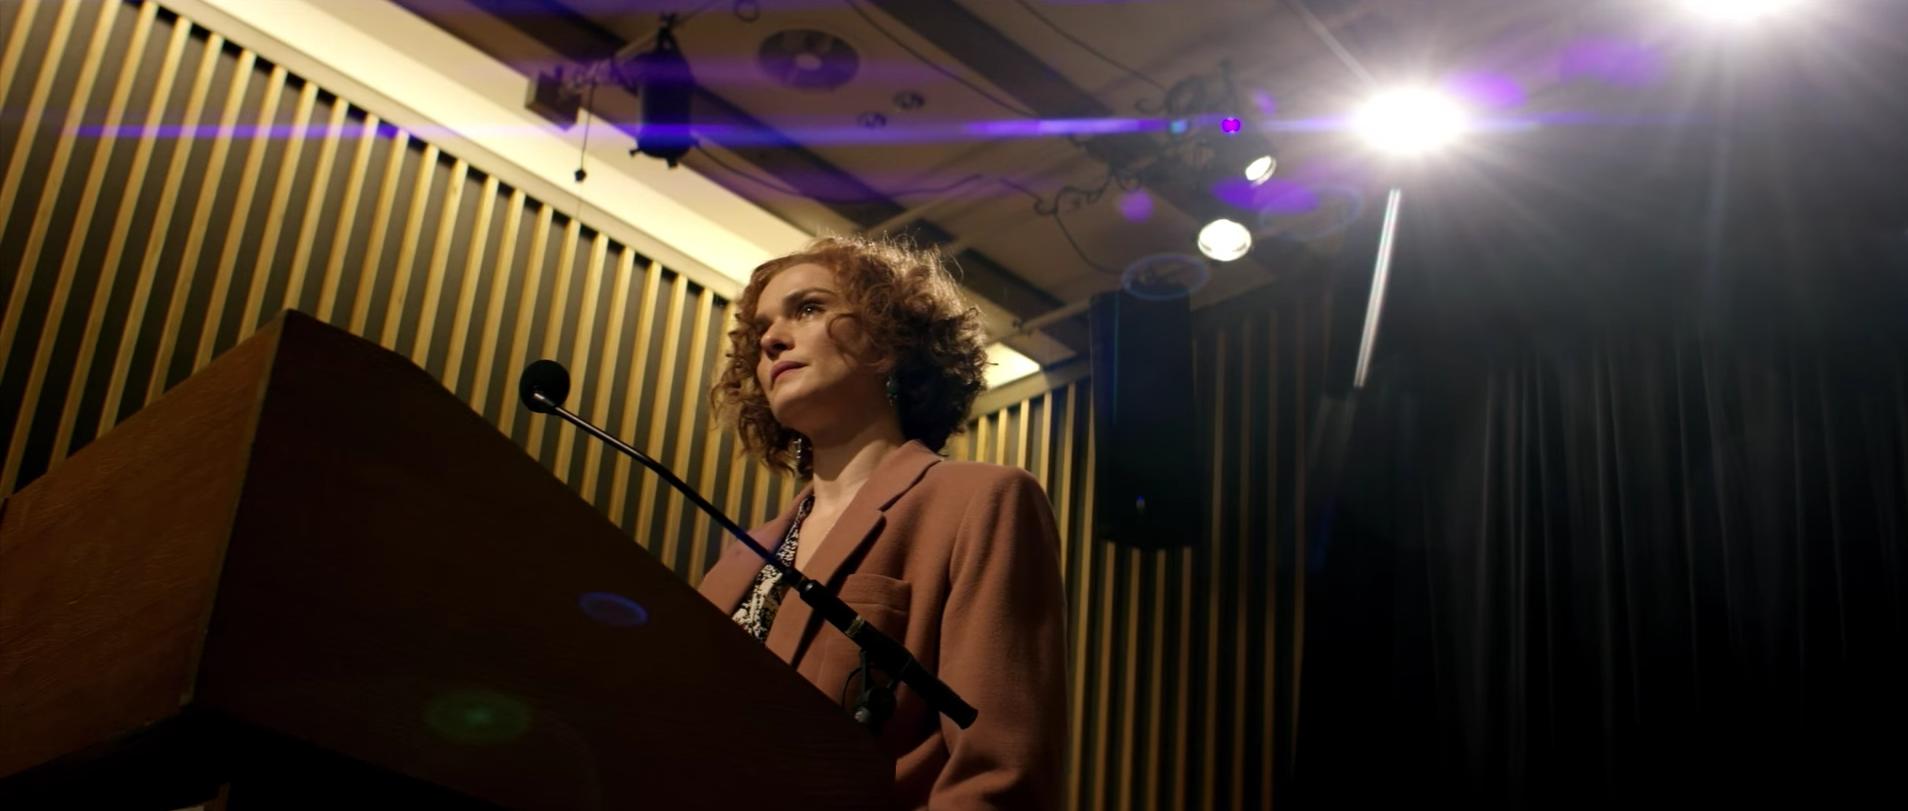 Rachel Weisz must fight for the truth in 'Denial'